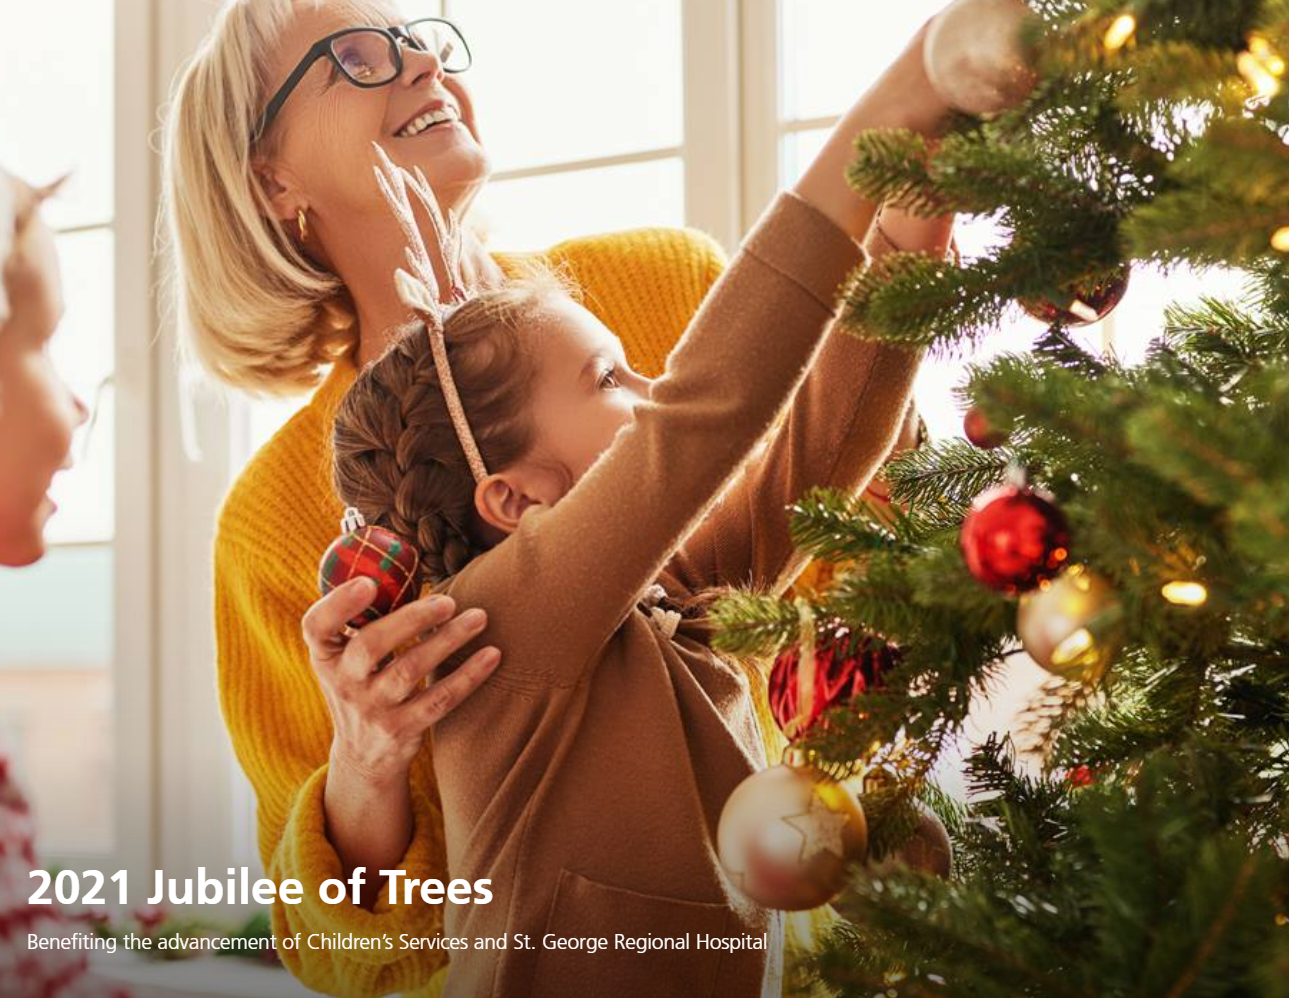 2021 jubilee of trees